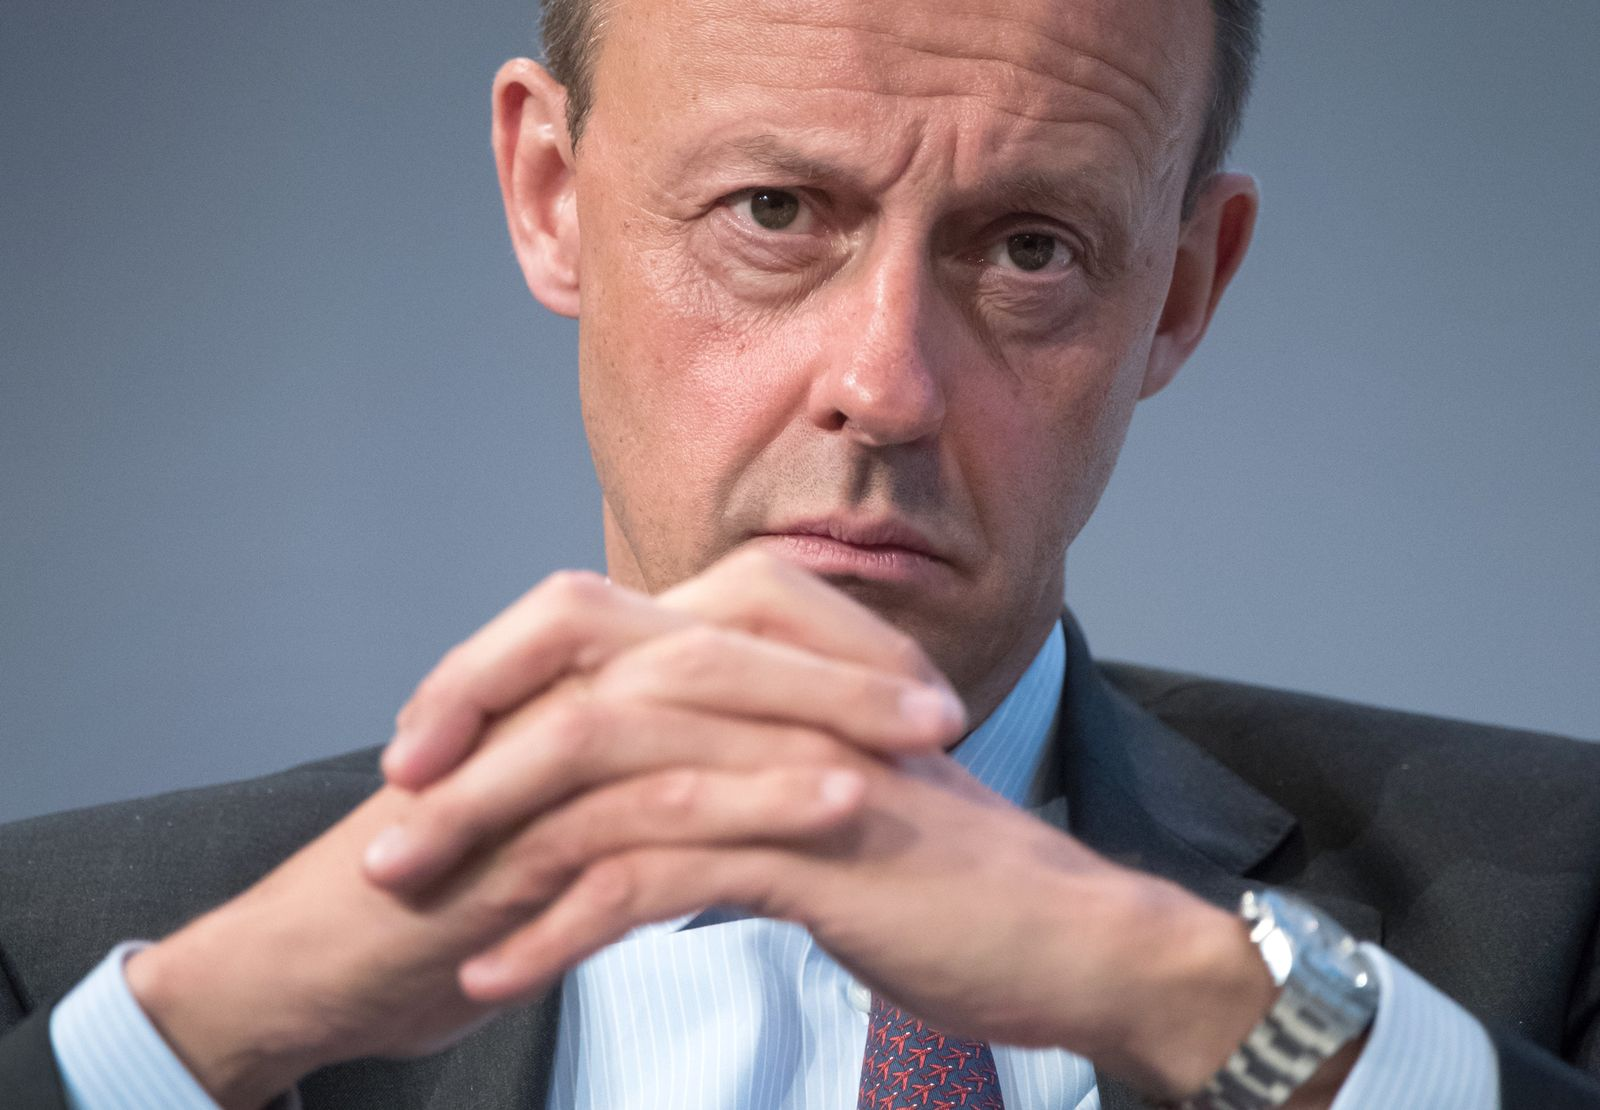 Politikveteranen/ Friedrich Merz